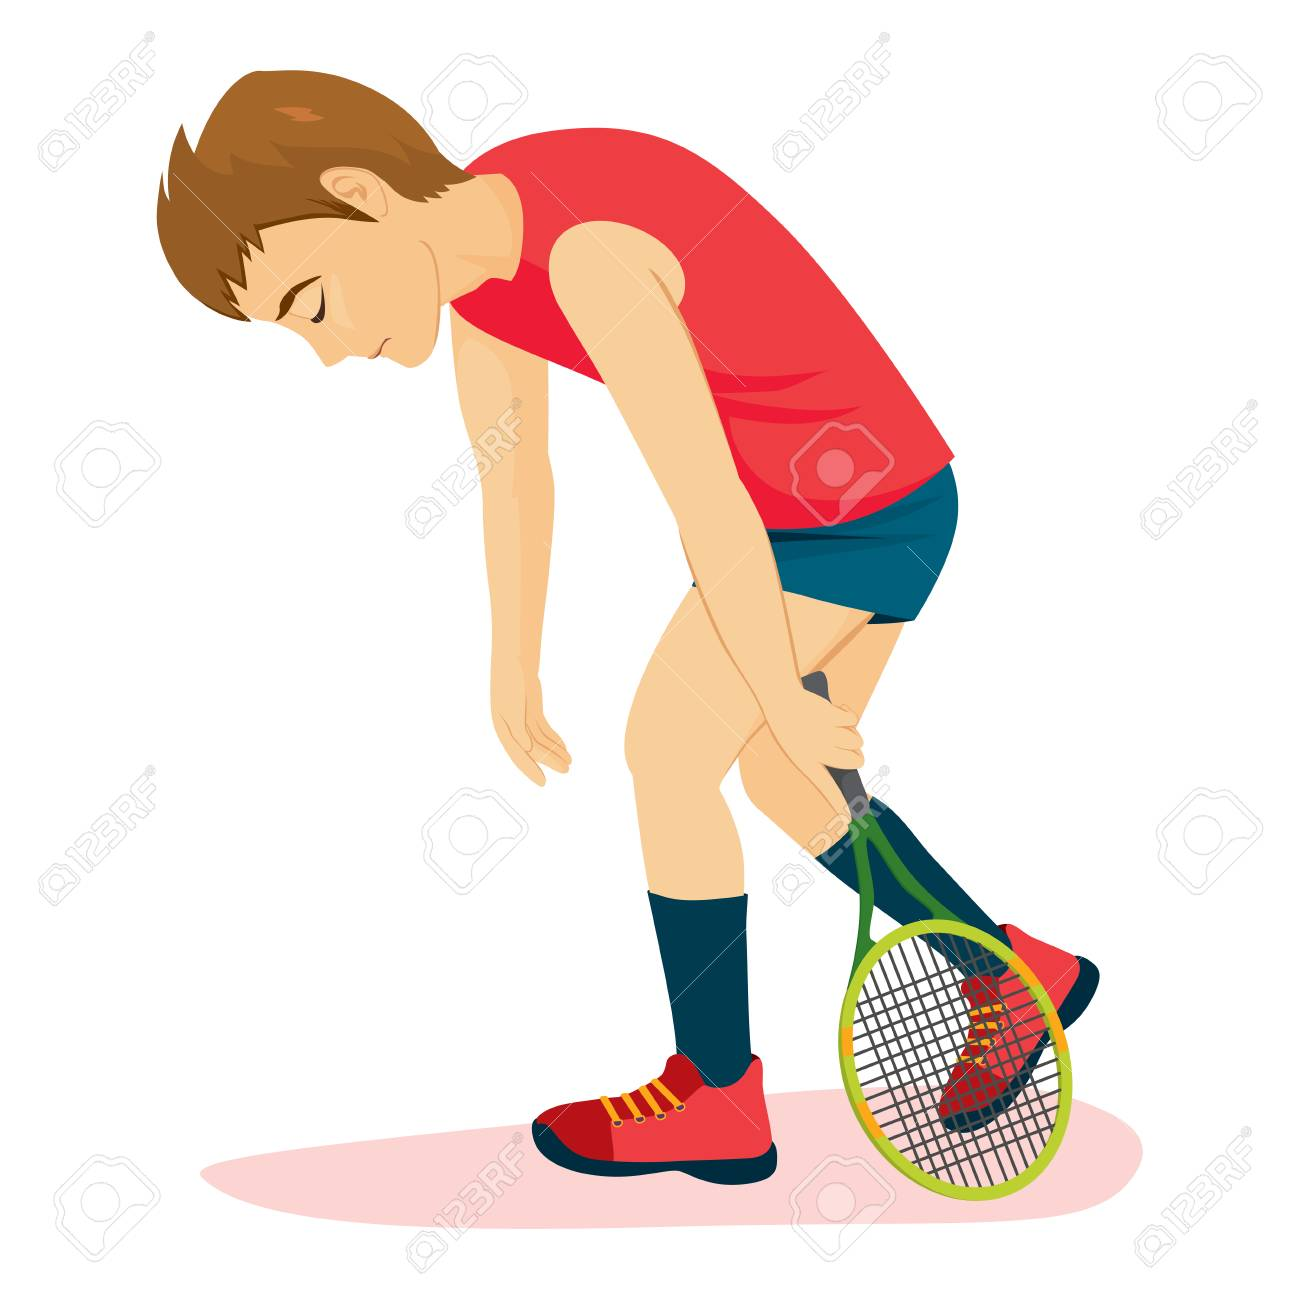 Defeated sad tennis player man walking depressed with racket - 109790116